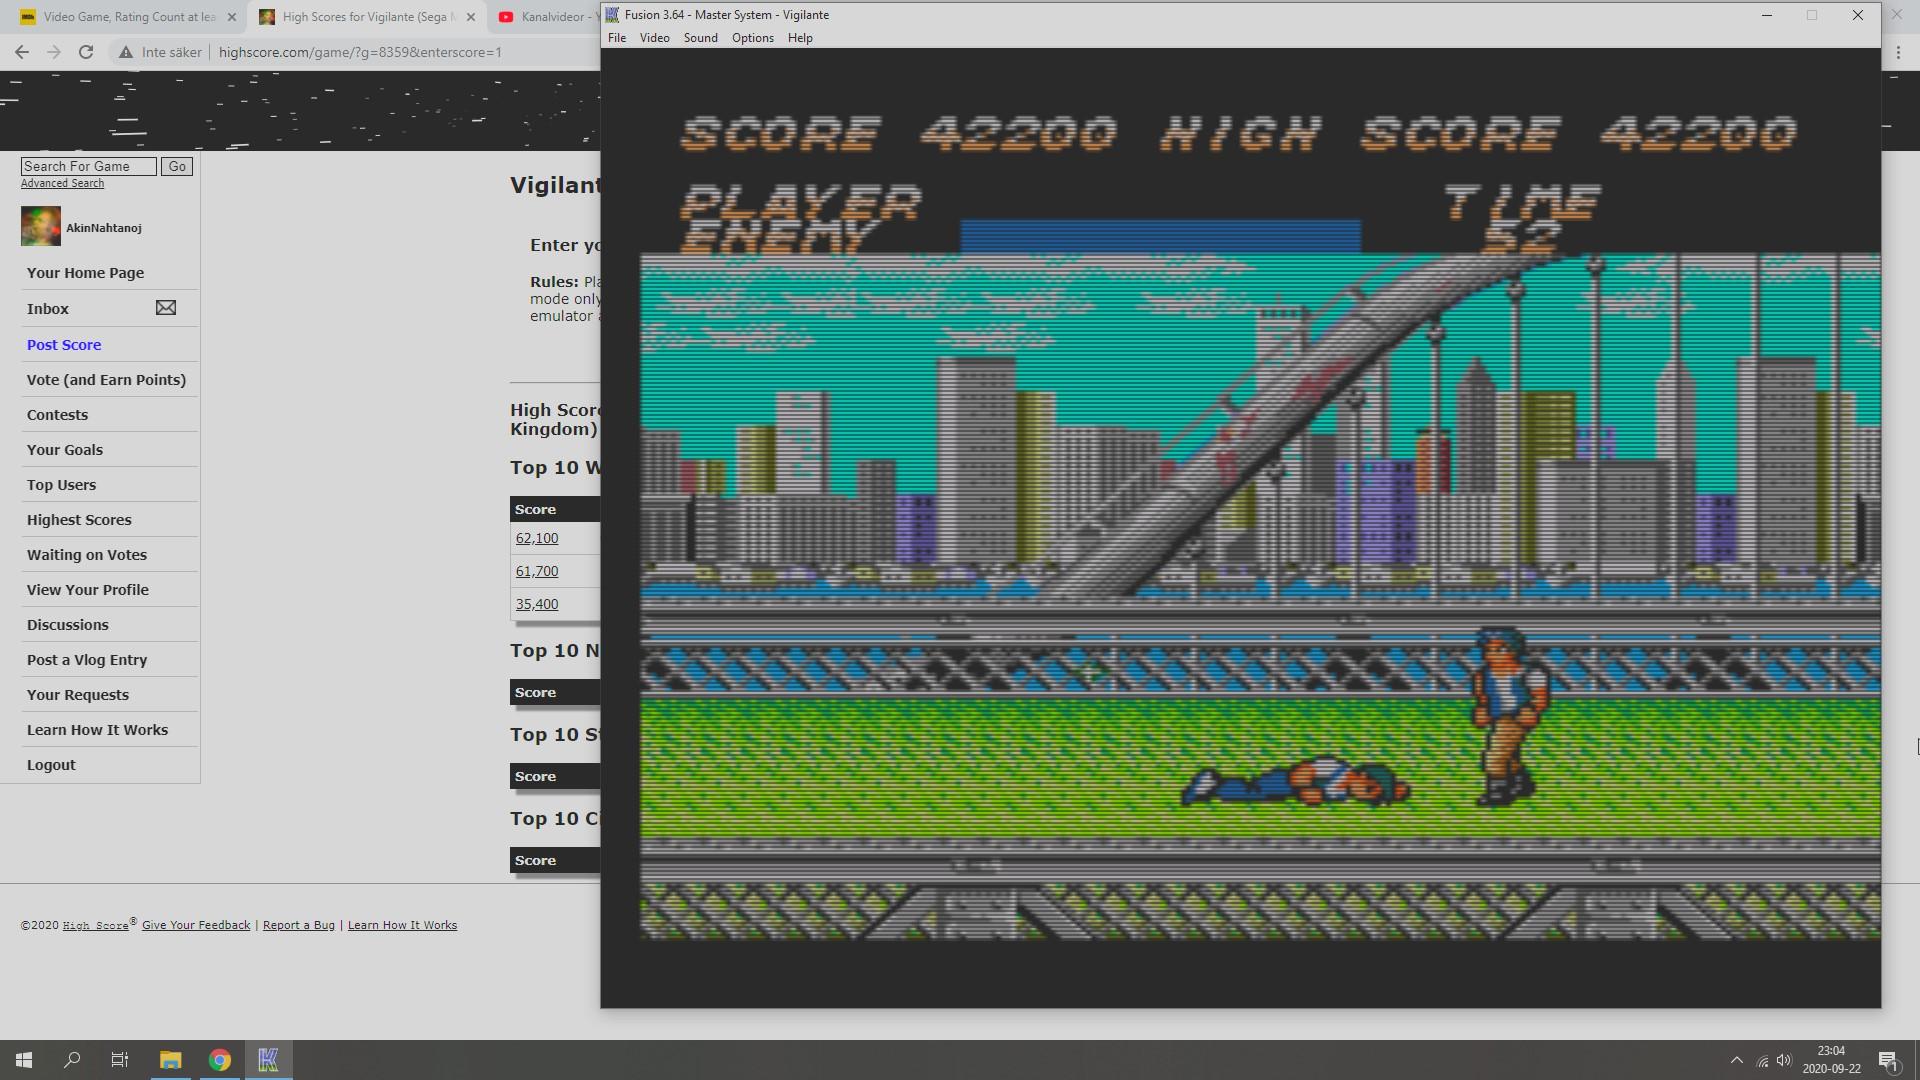 AkinNahtanoj: Vigilante (Sega Master System Emulated) 42,200 points on 2020-09-22 16:20:09